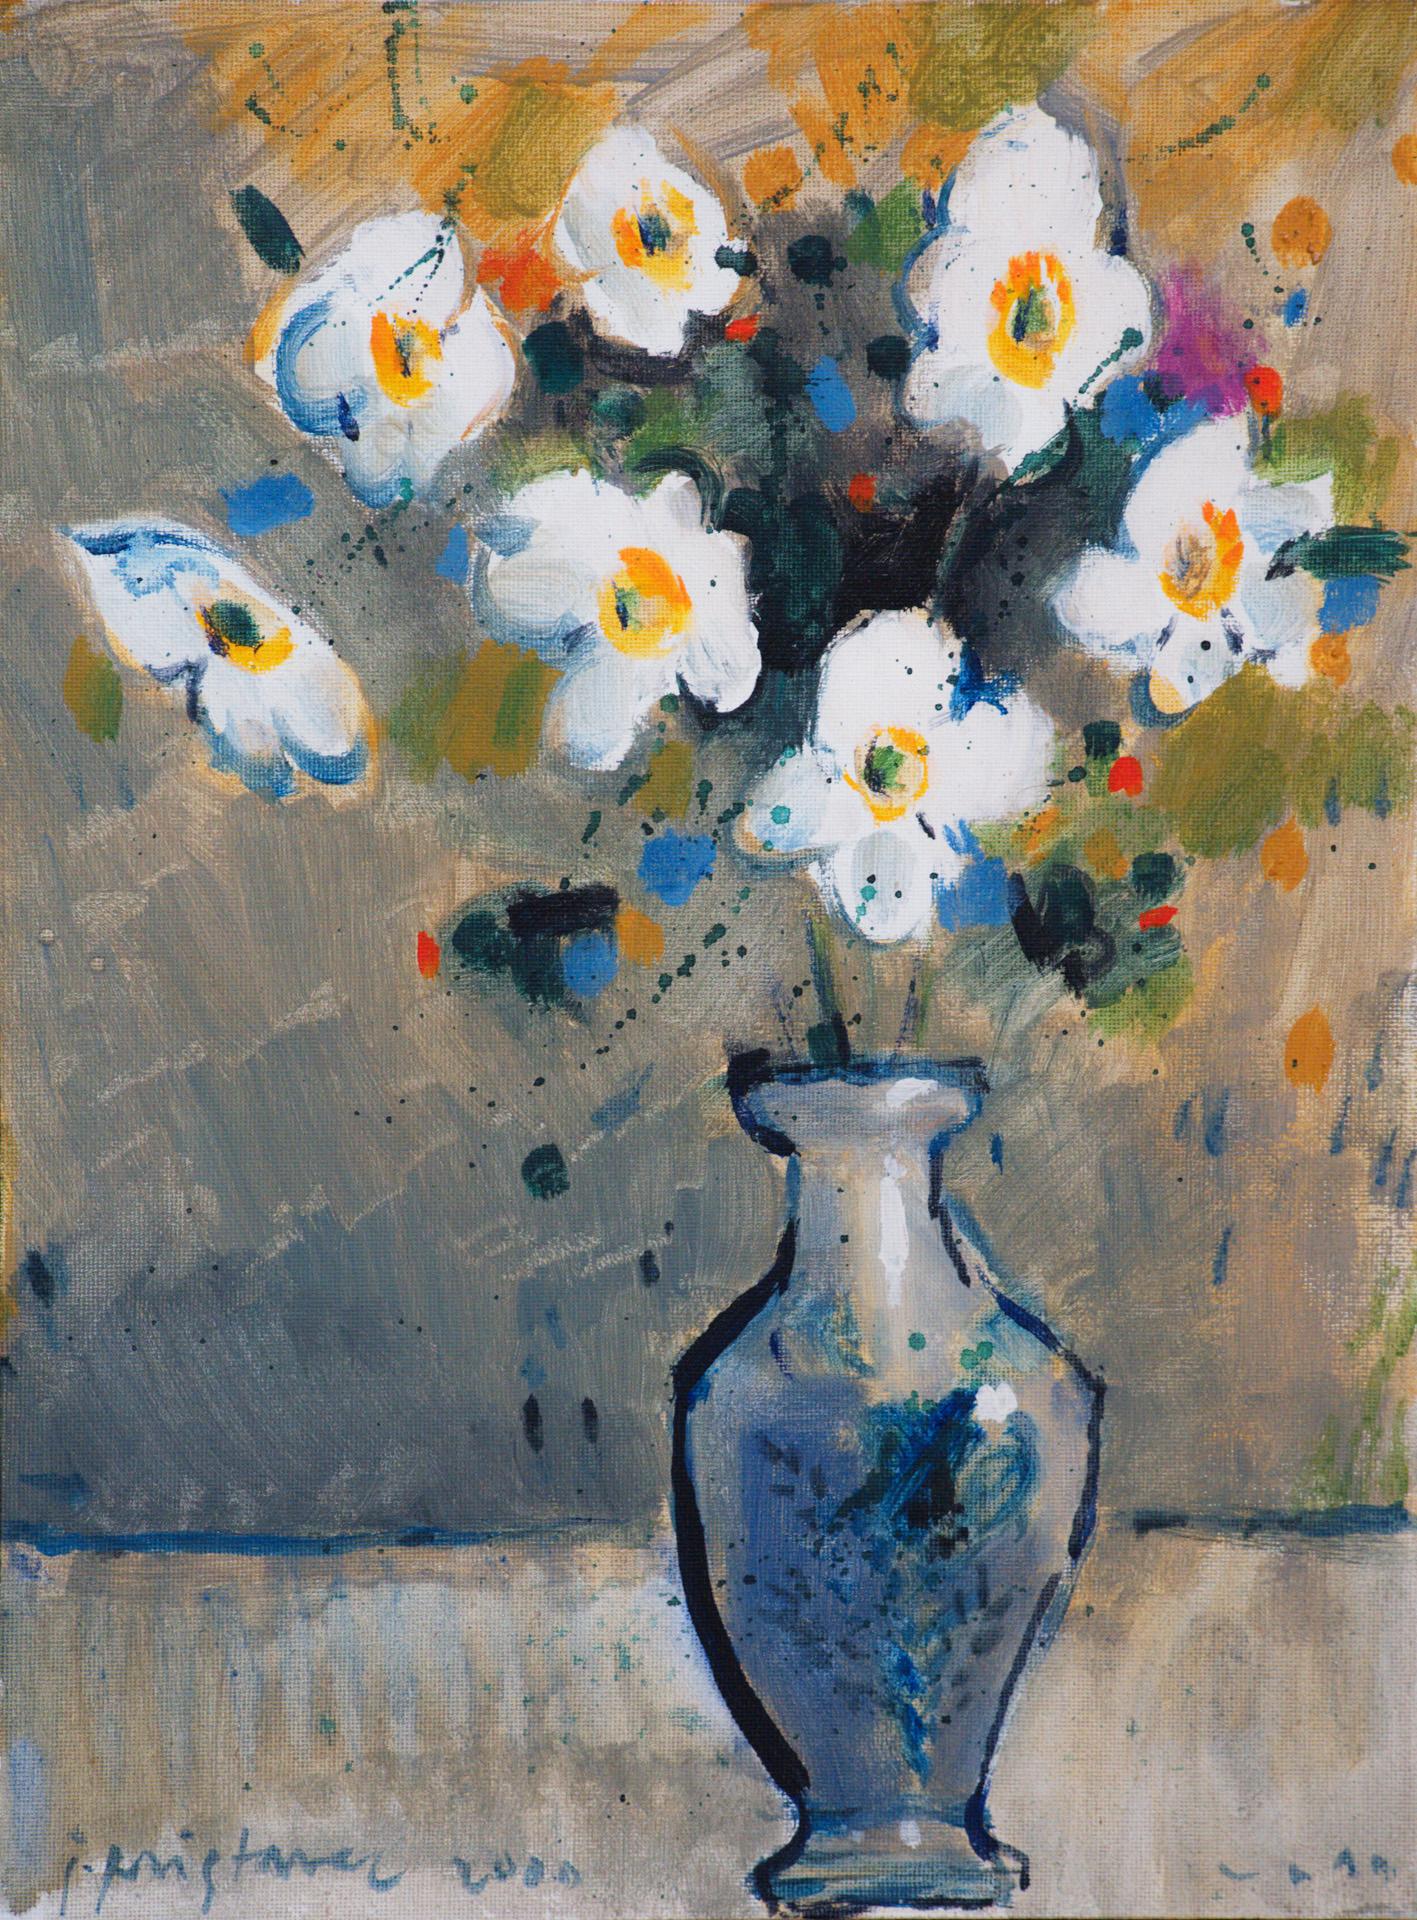 Still Life IX / 2000 / oil on canvas / 30x40 cm